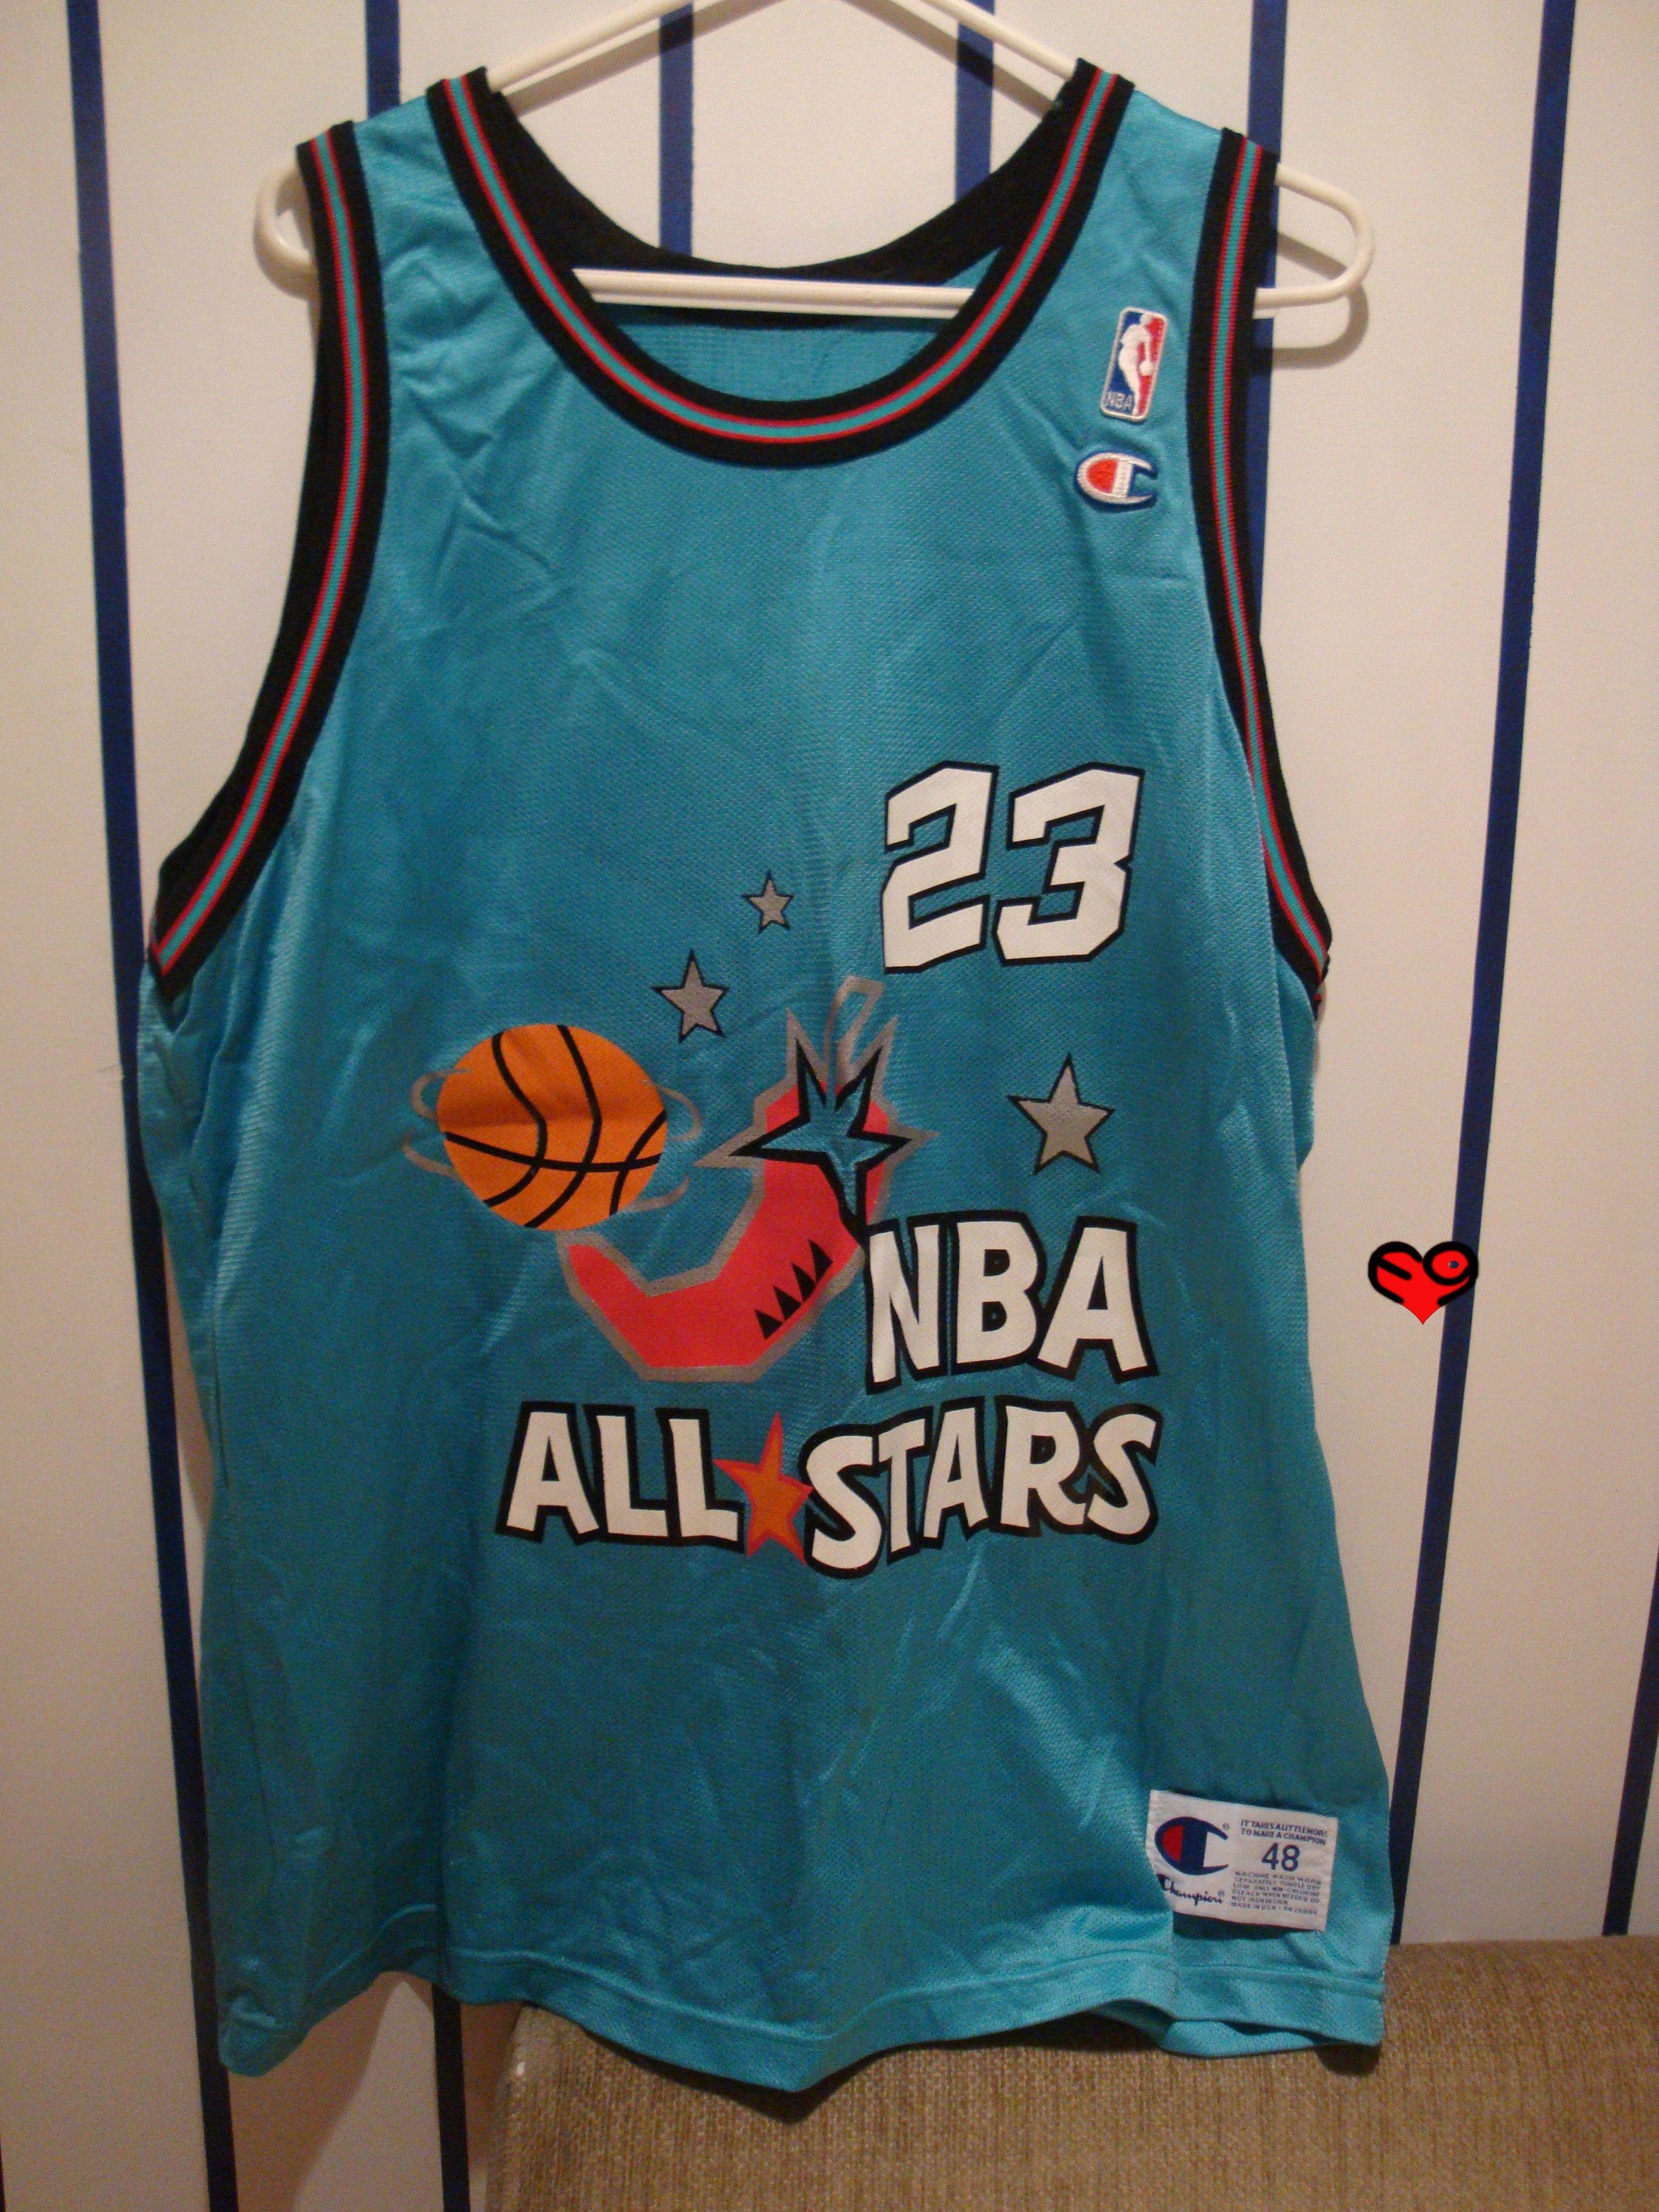 best service 77233 6dfa8 1996 Jordan All Star Replica Jersey (front) | Michael Jordan ...